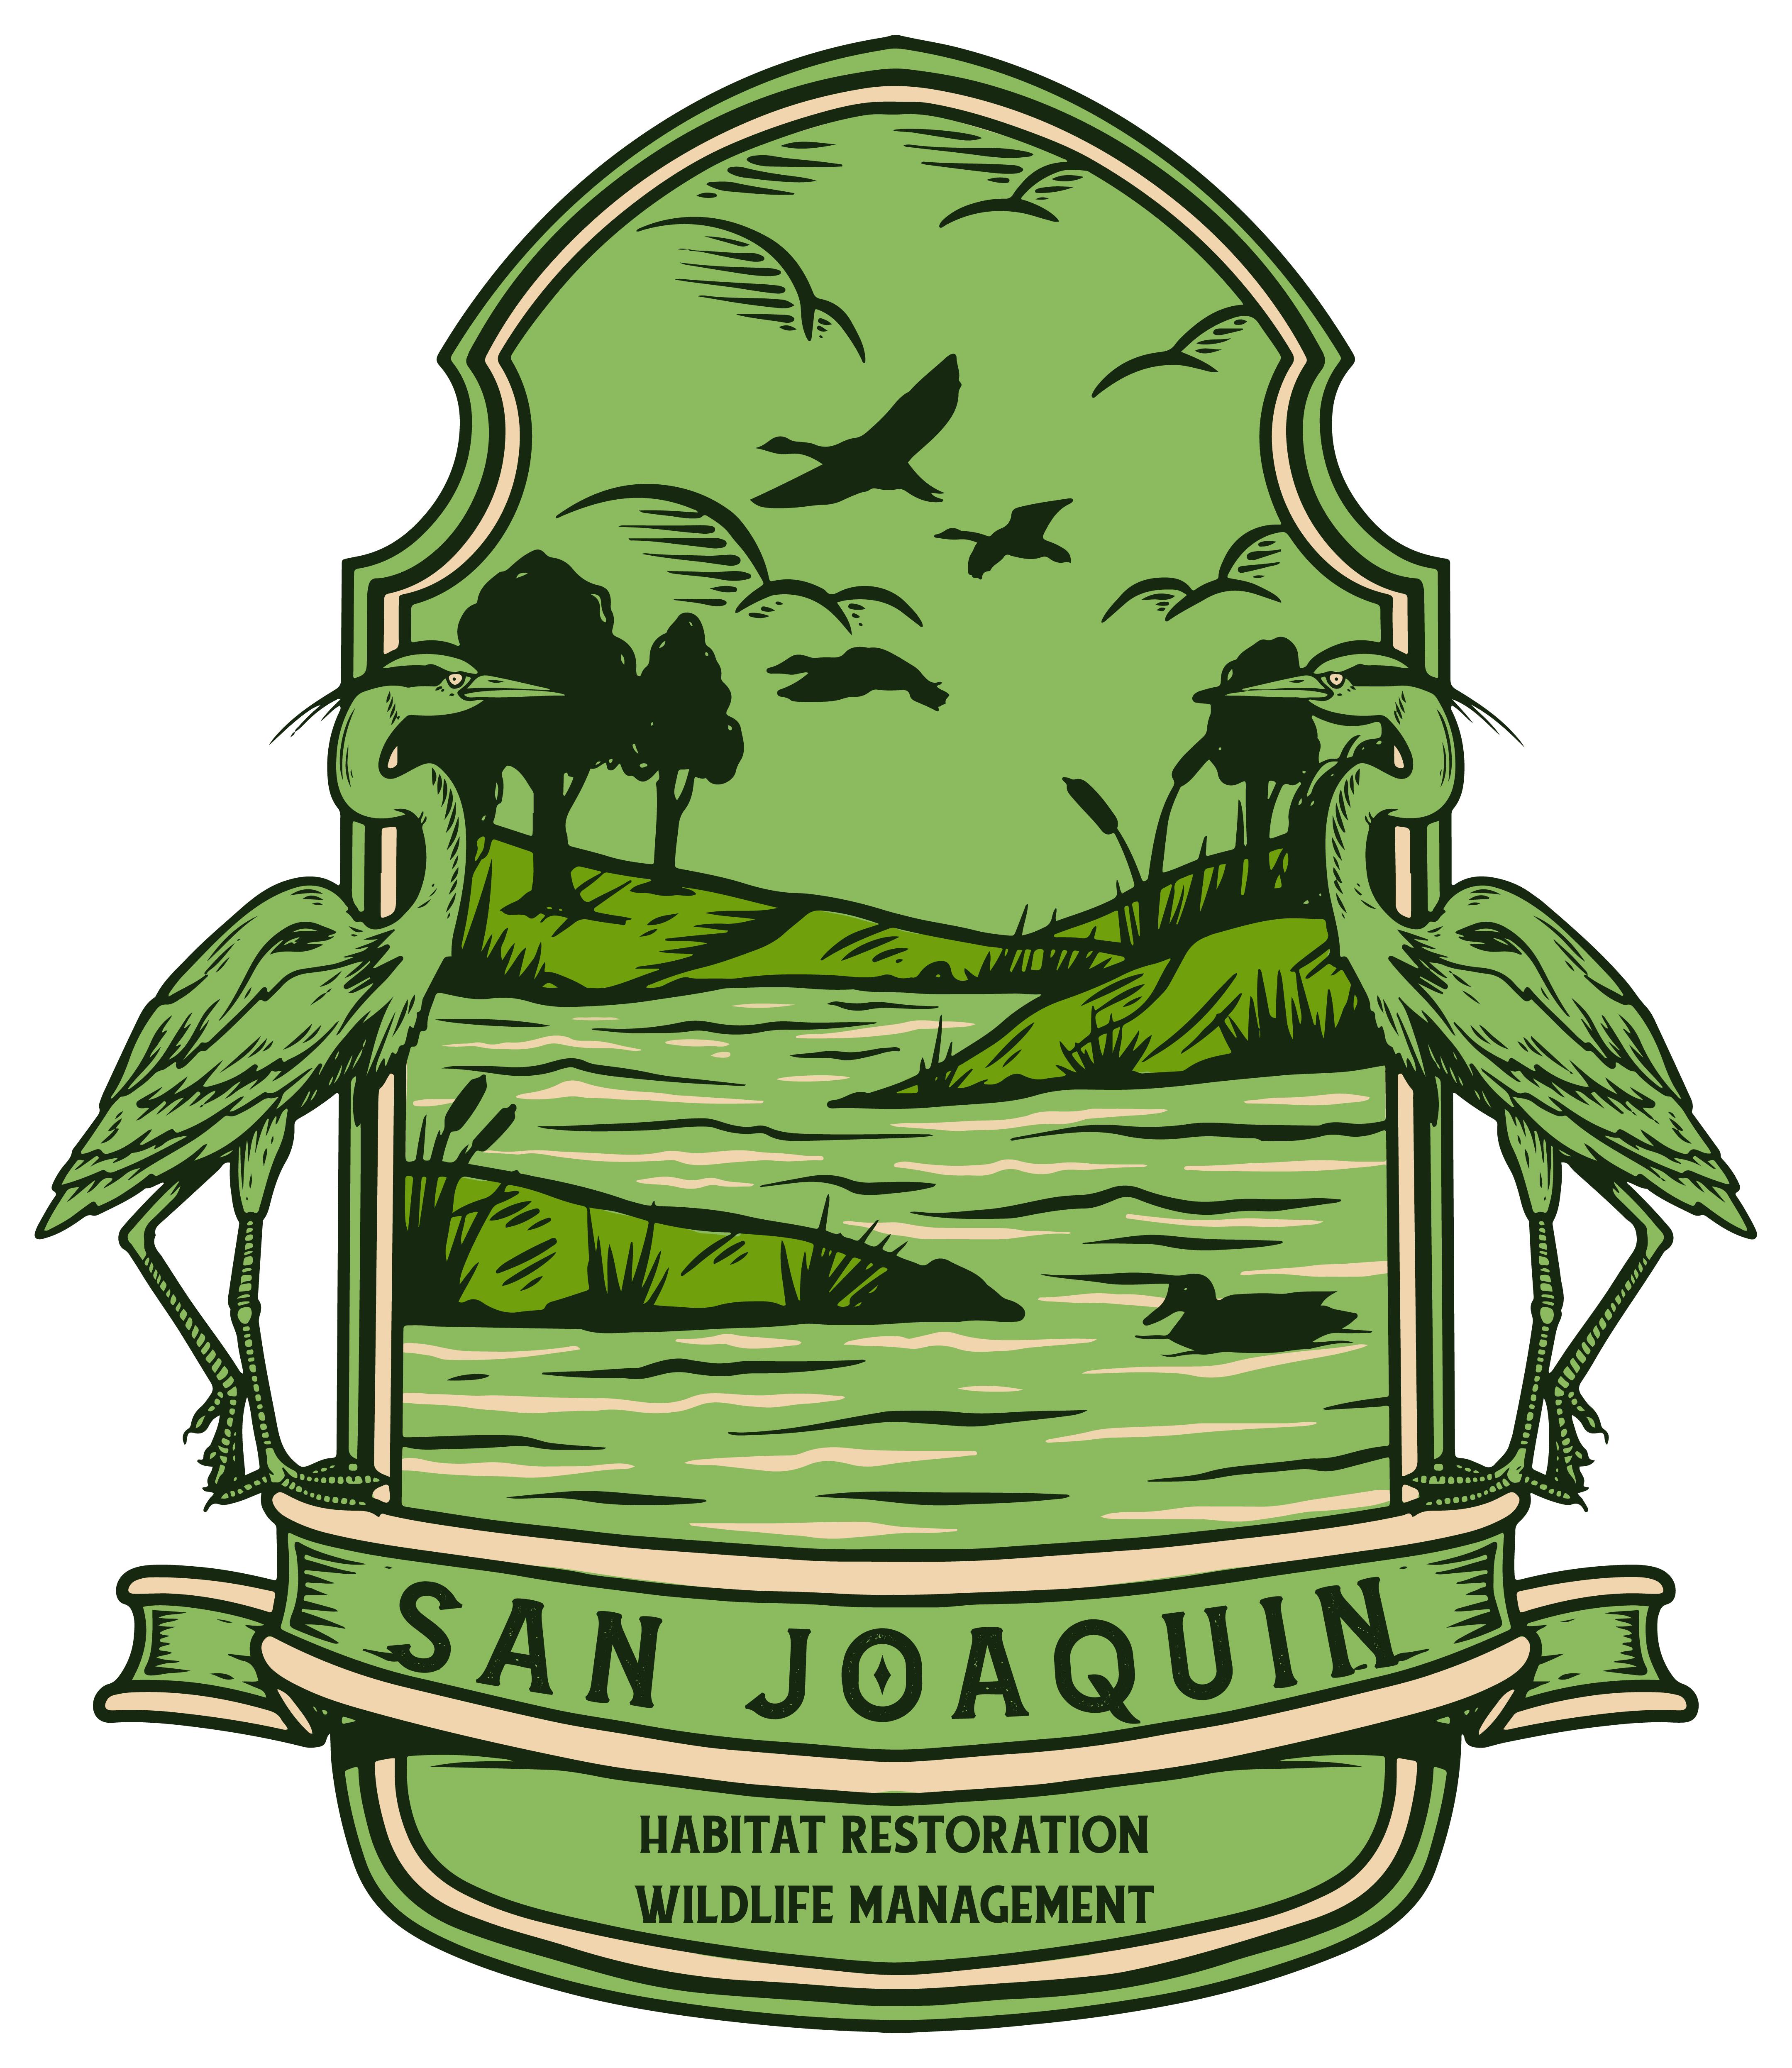 San Joaquin Valley Wildlife Habitat Restoration Company